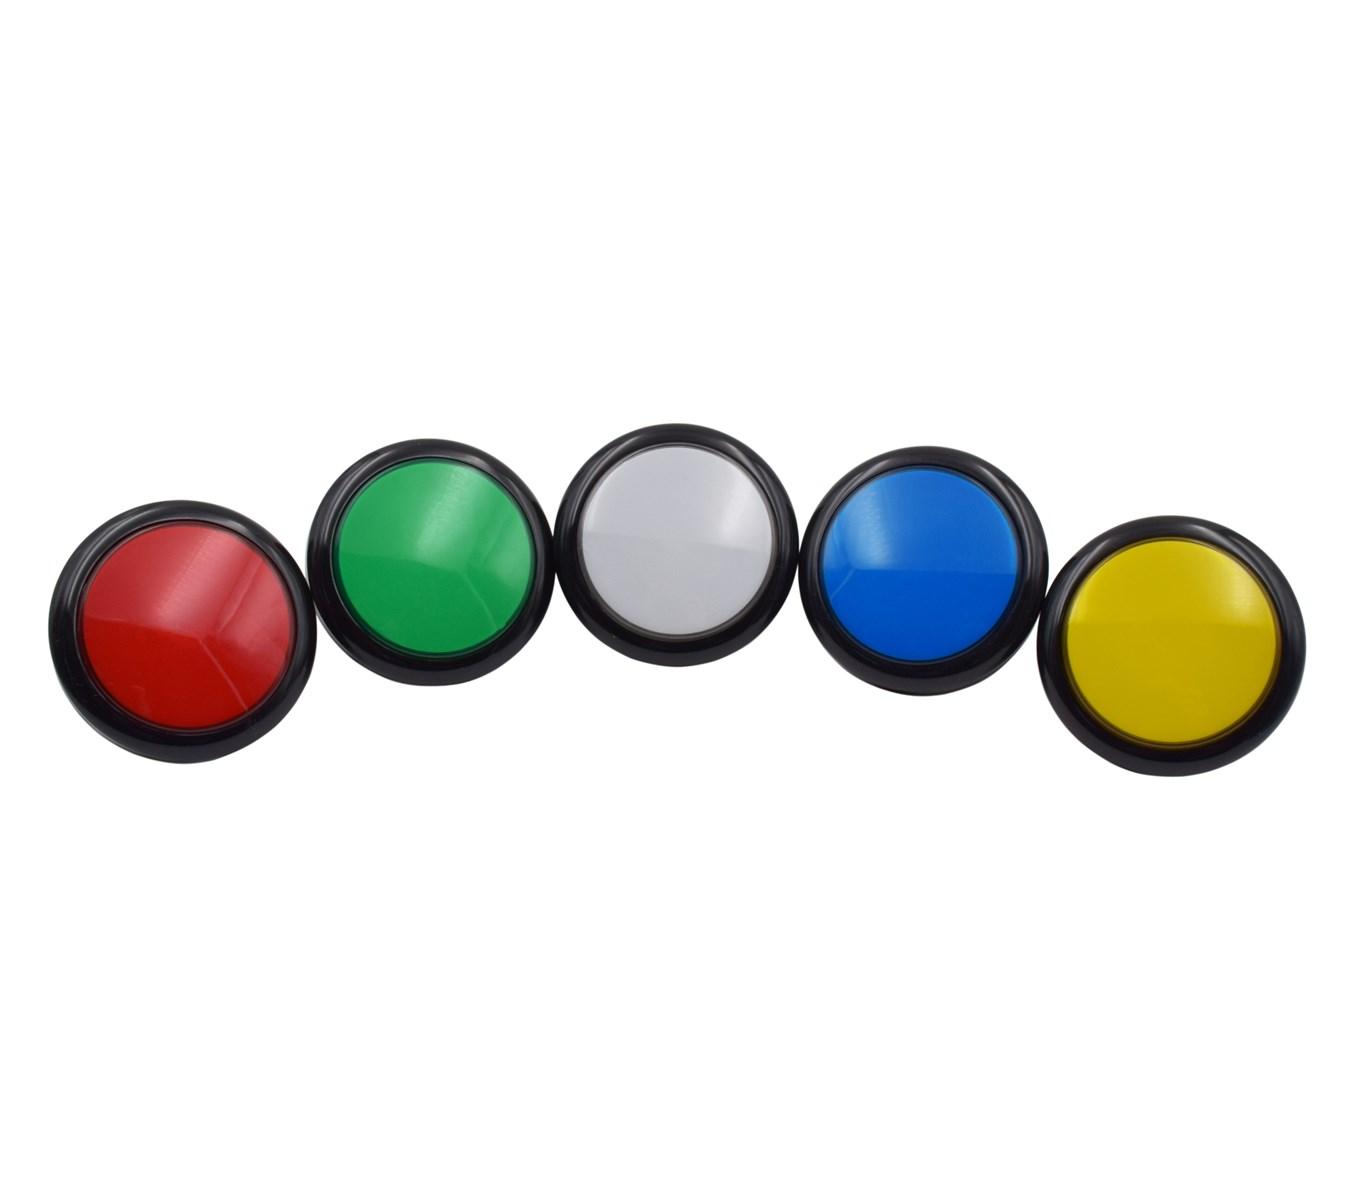 flat top arcade ip67 slot machine 5v led 100mm led illuminated push button switch and switches